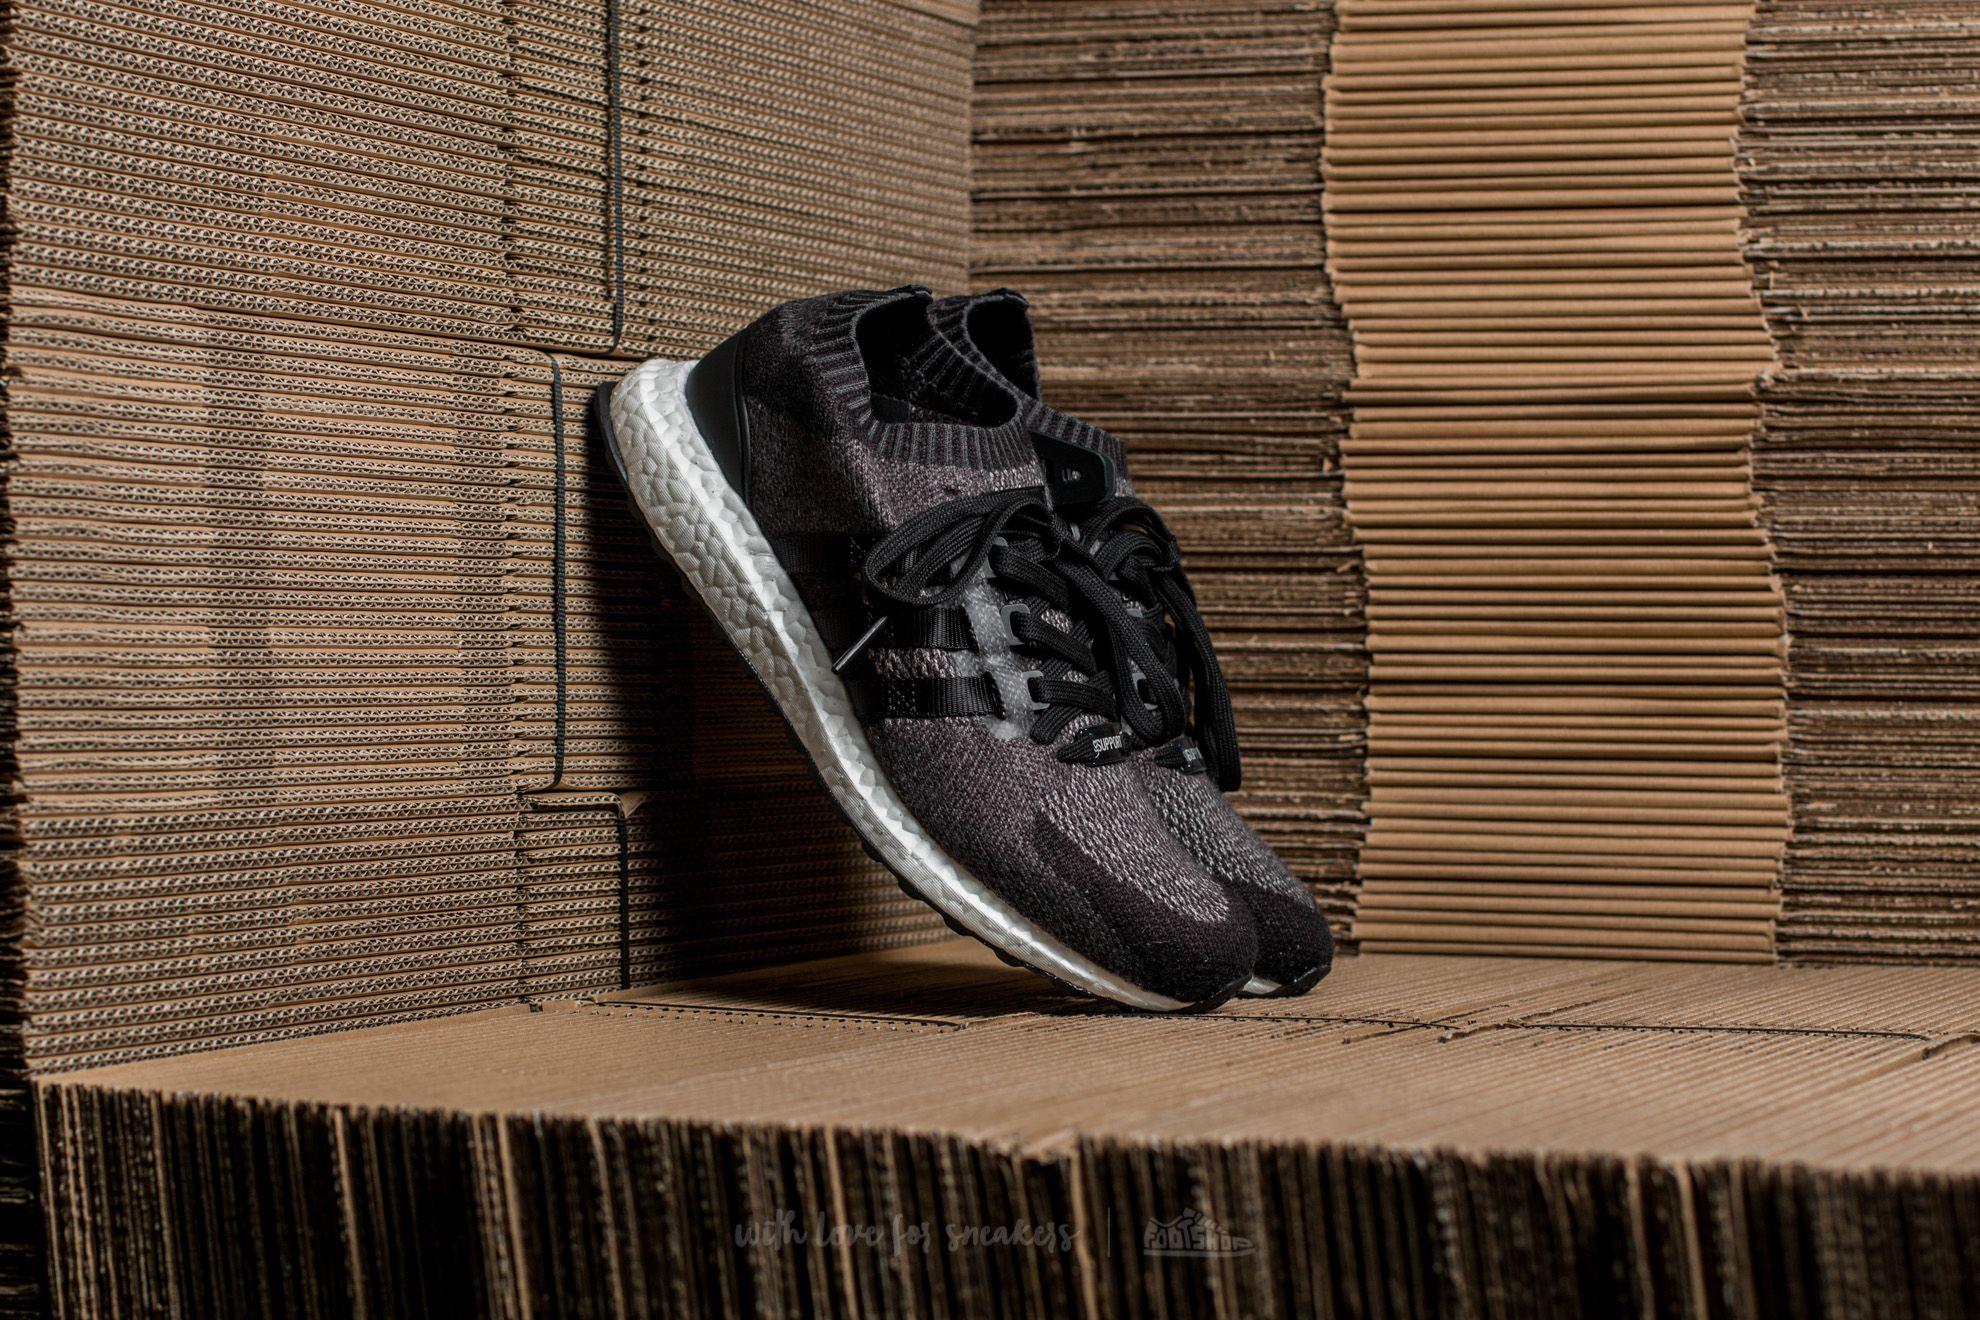 Black Primeknit Adidas Core Eqt Support WhiteFootshop Ftw Ultra AL54jR